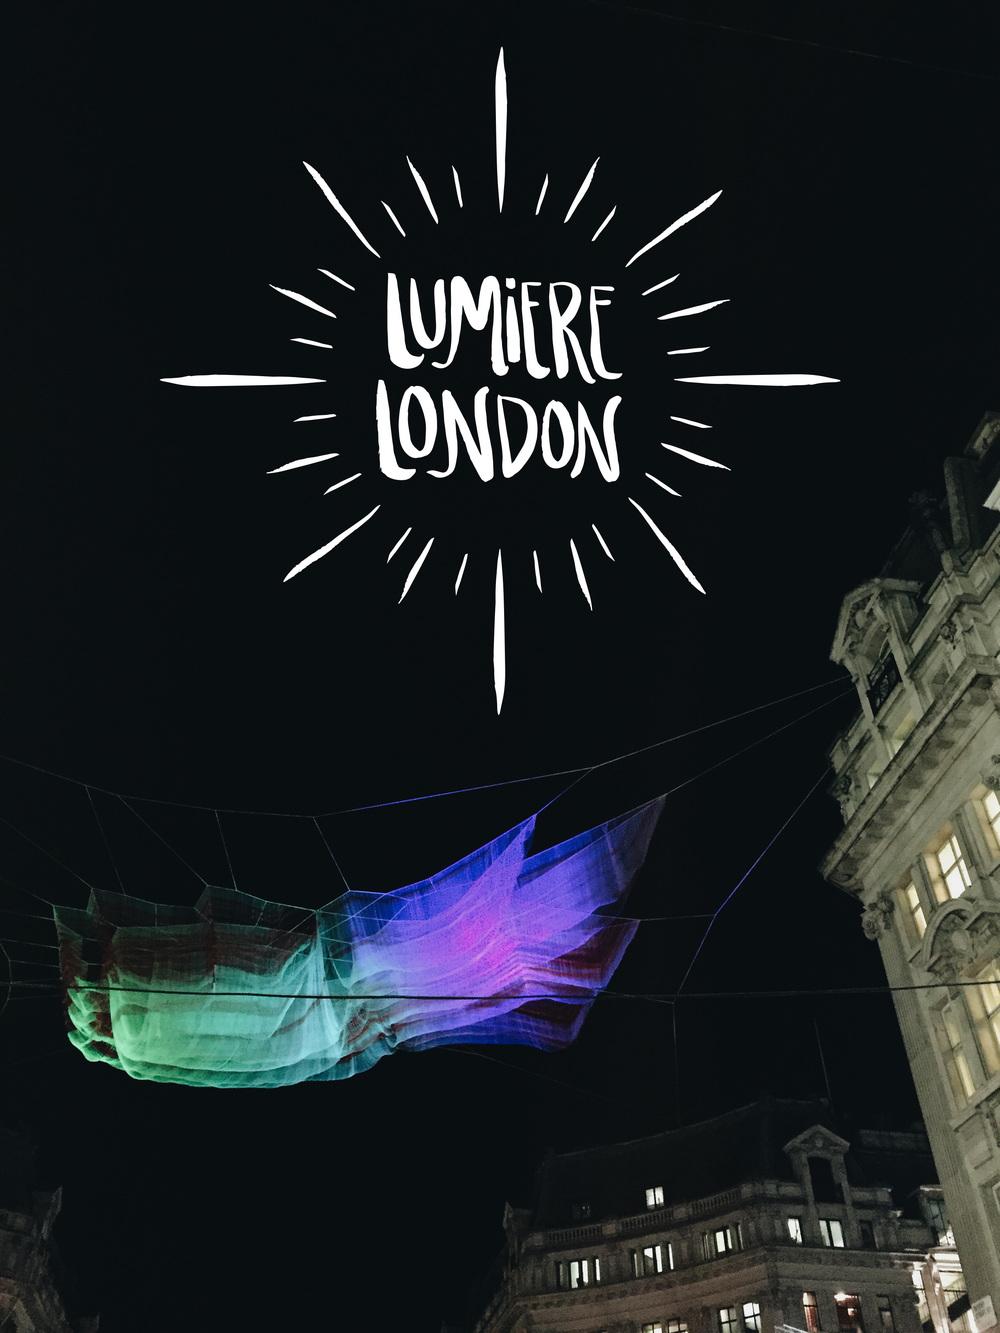 SOA_lumiere-london-2016.jpg